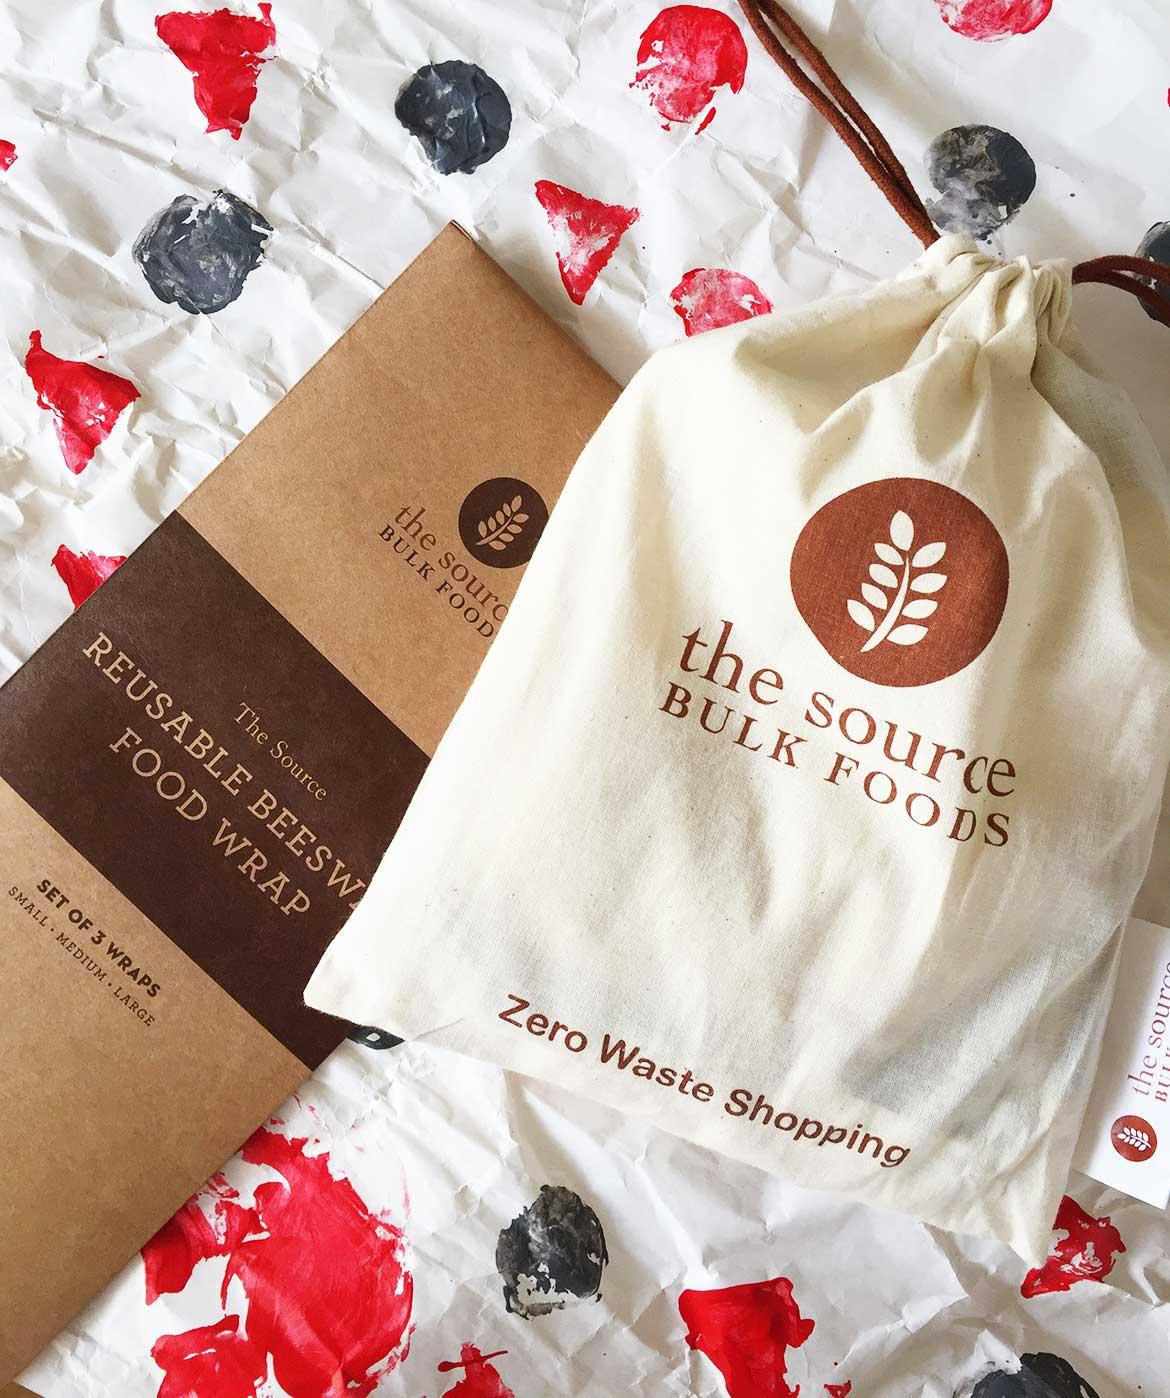 zero-waste-gifts-bulk-source-foods - Sew in Love